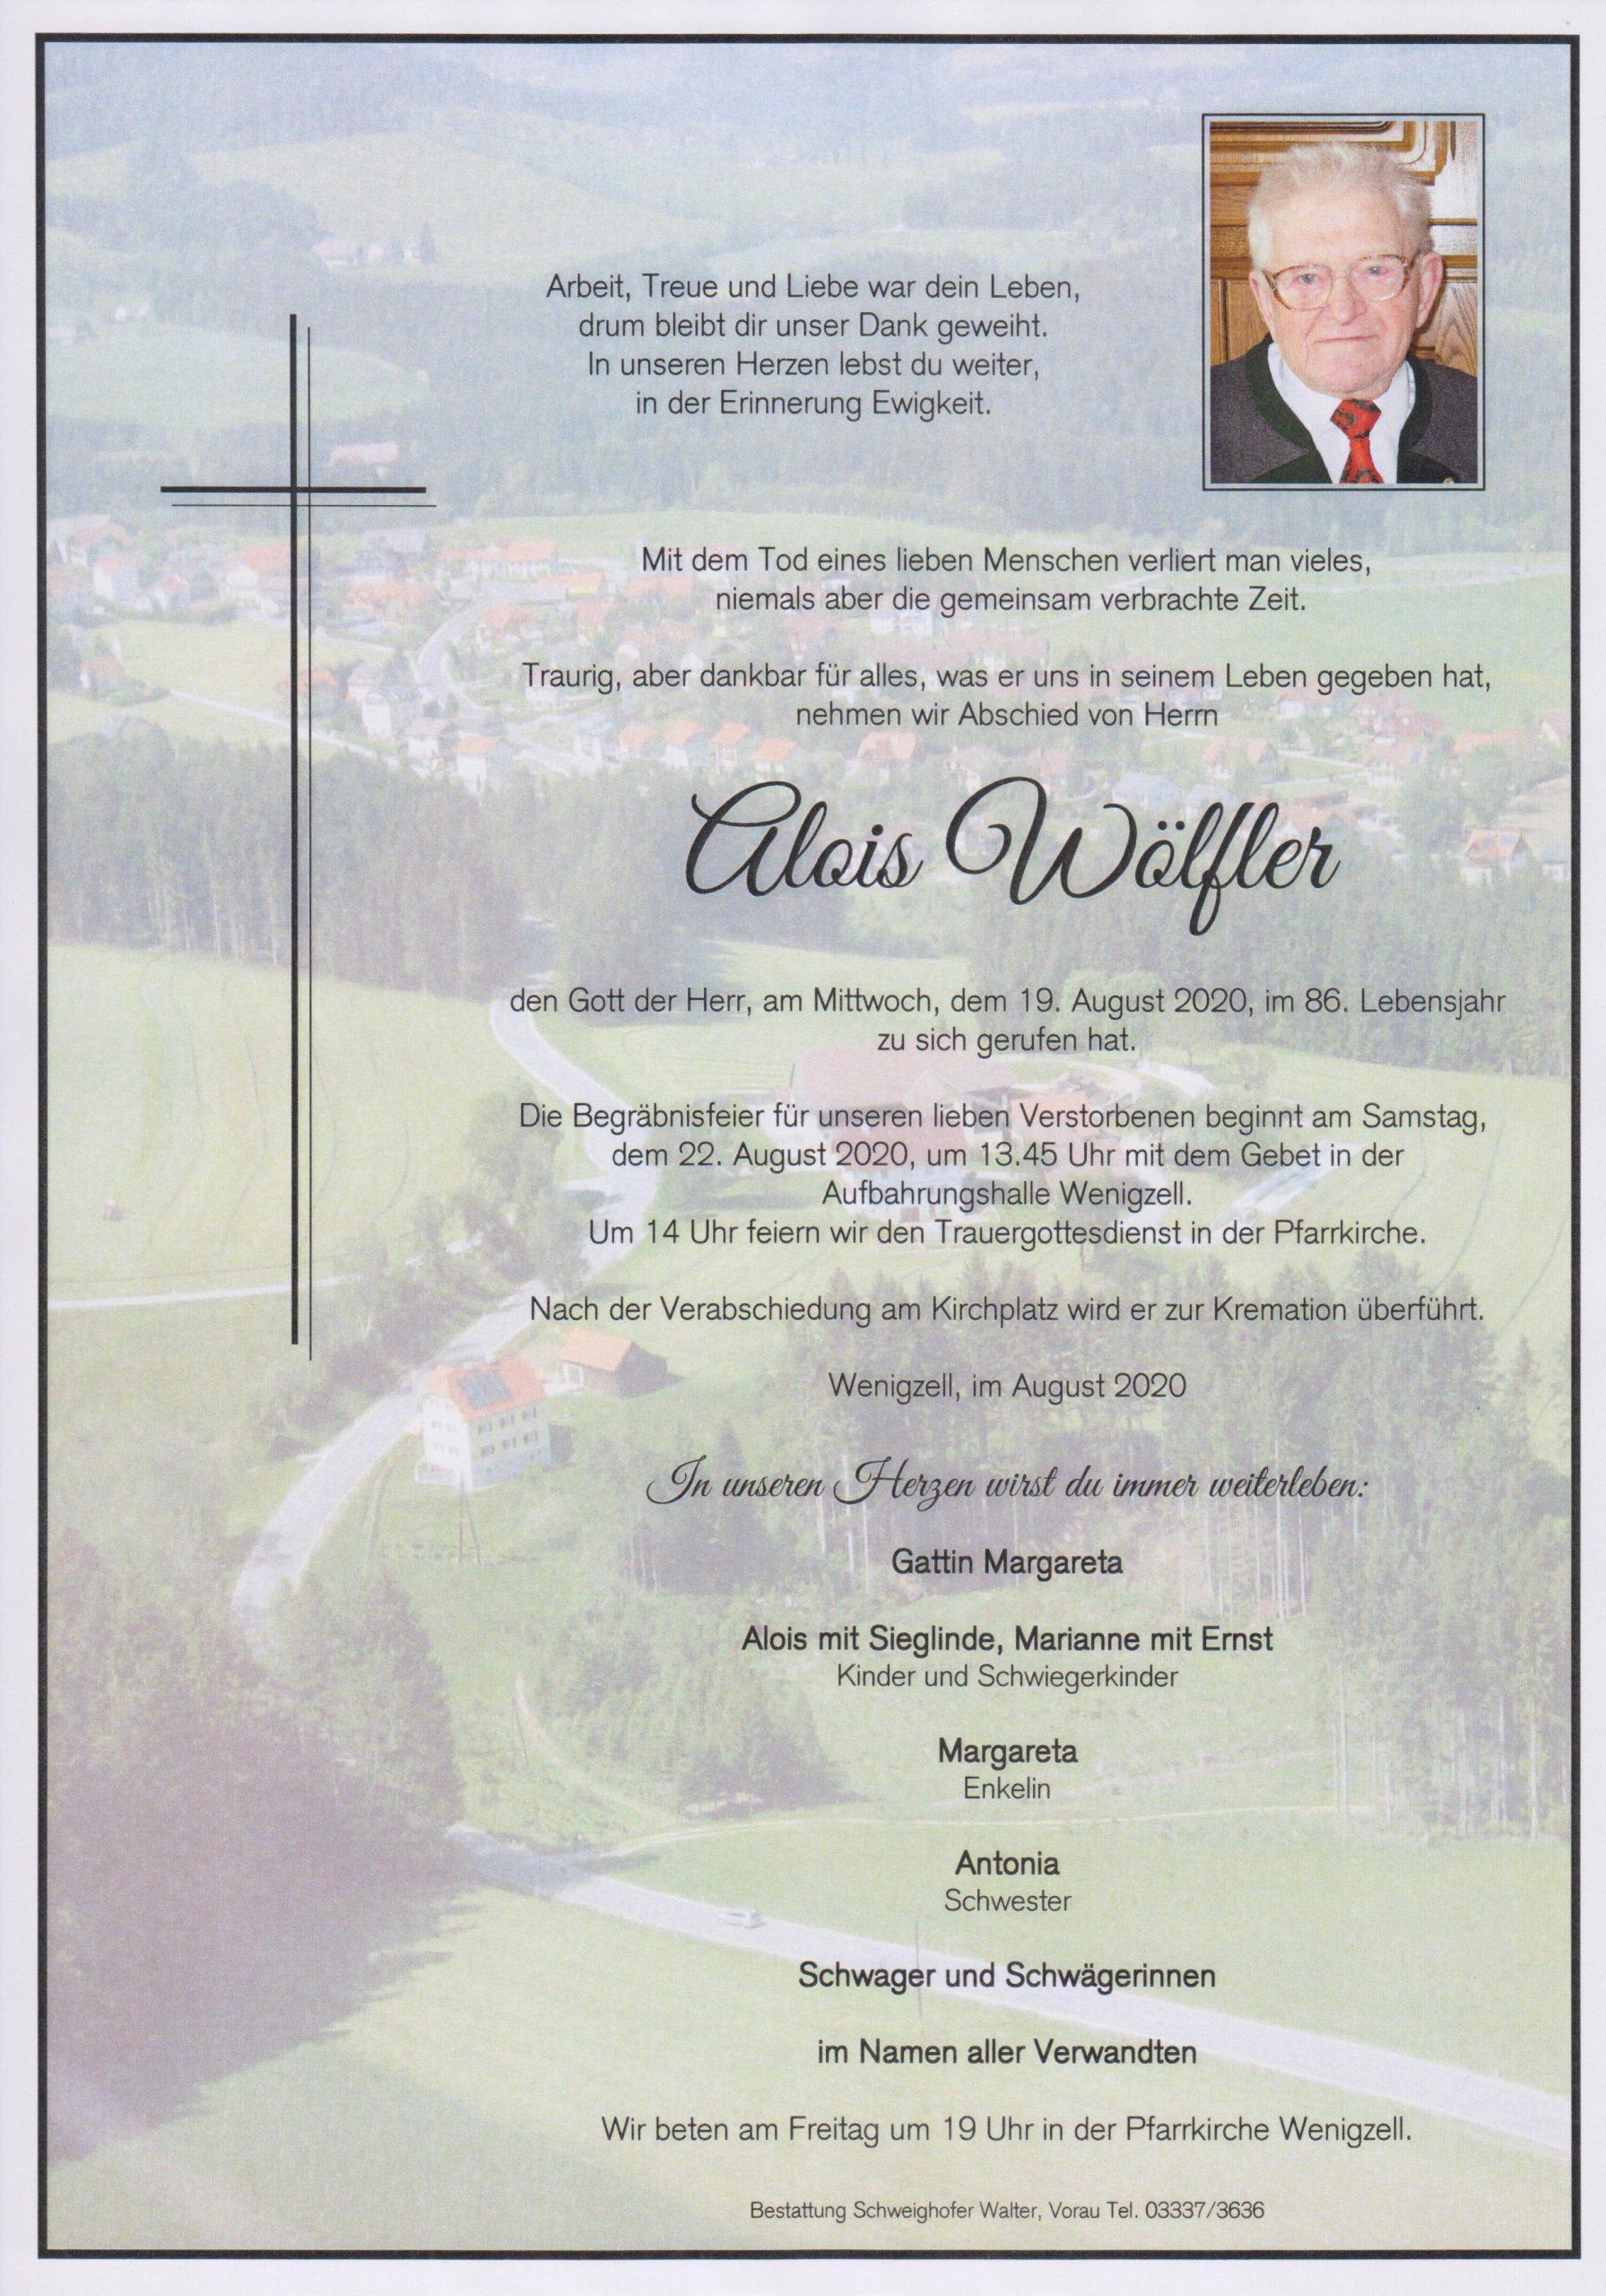 Alois Wöfler